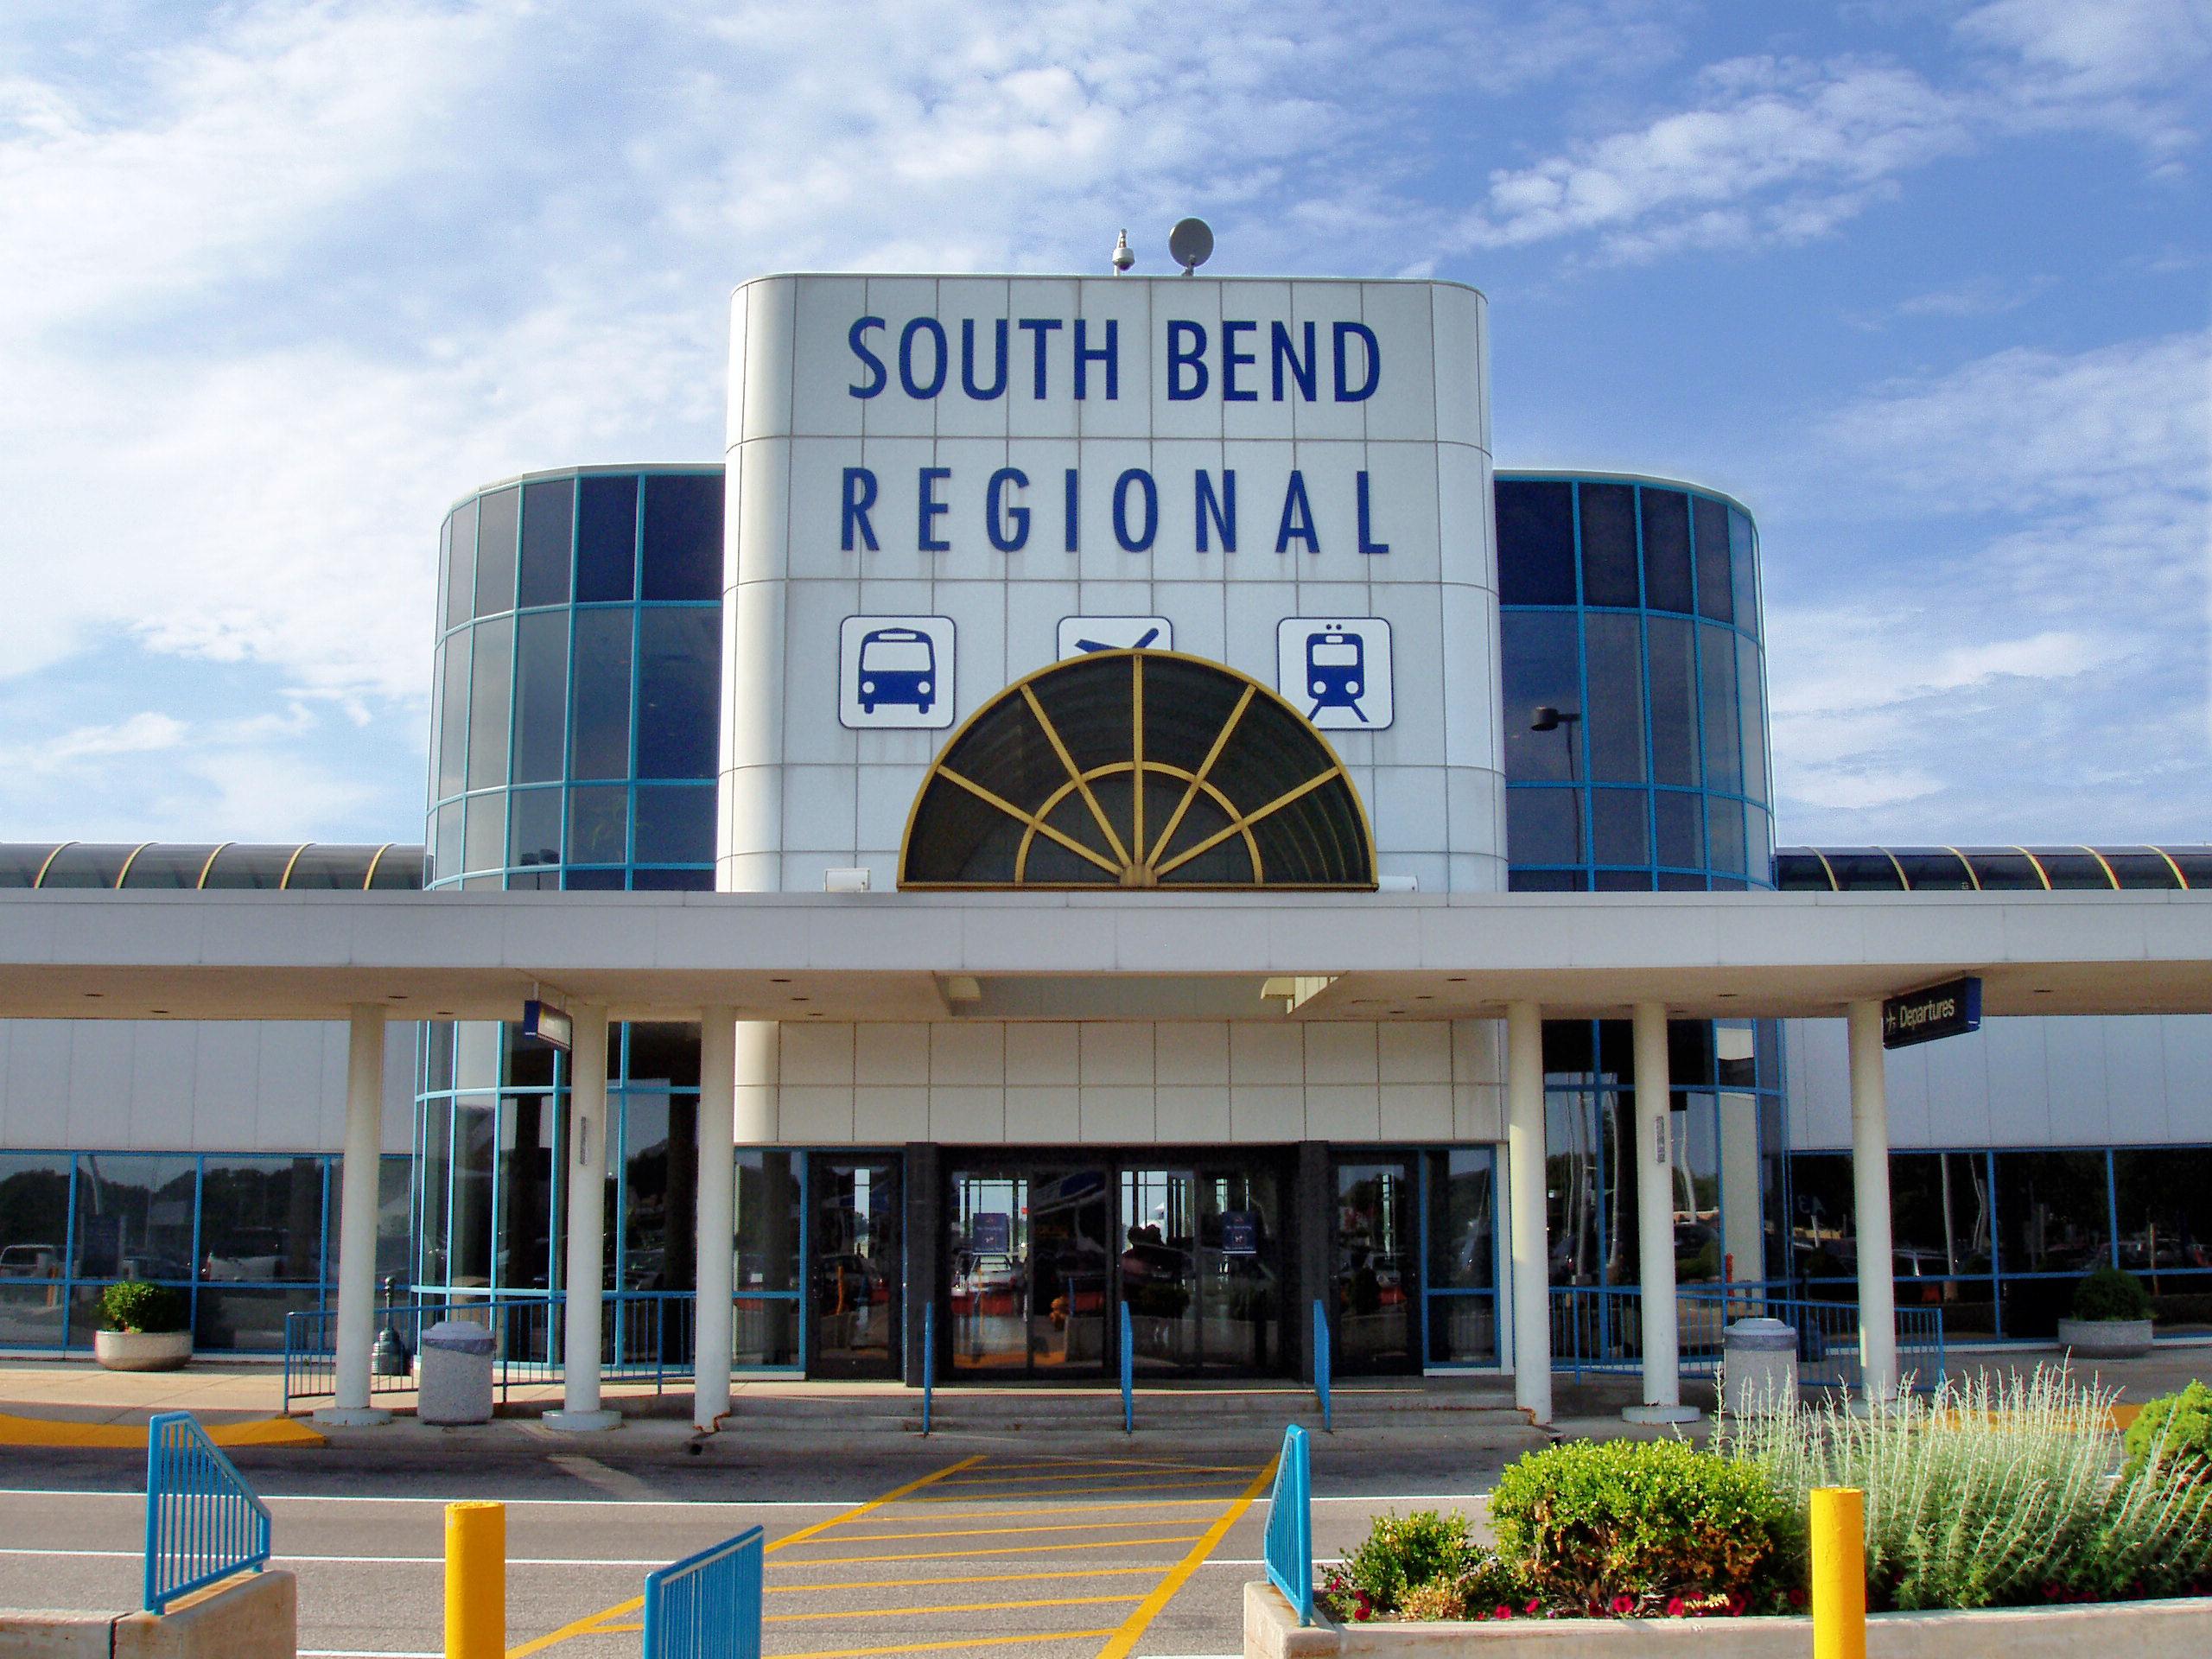 South Bend Regional